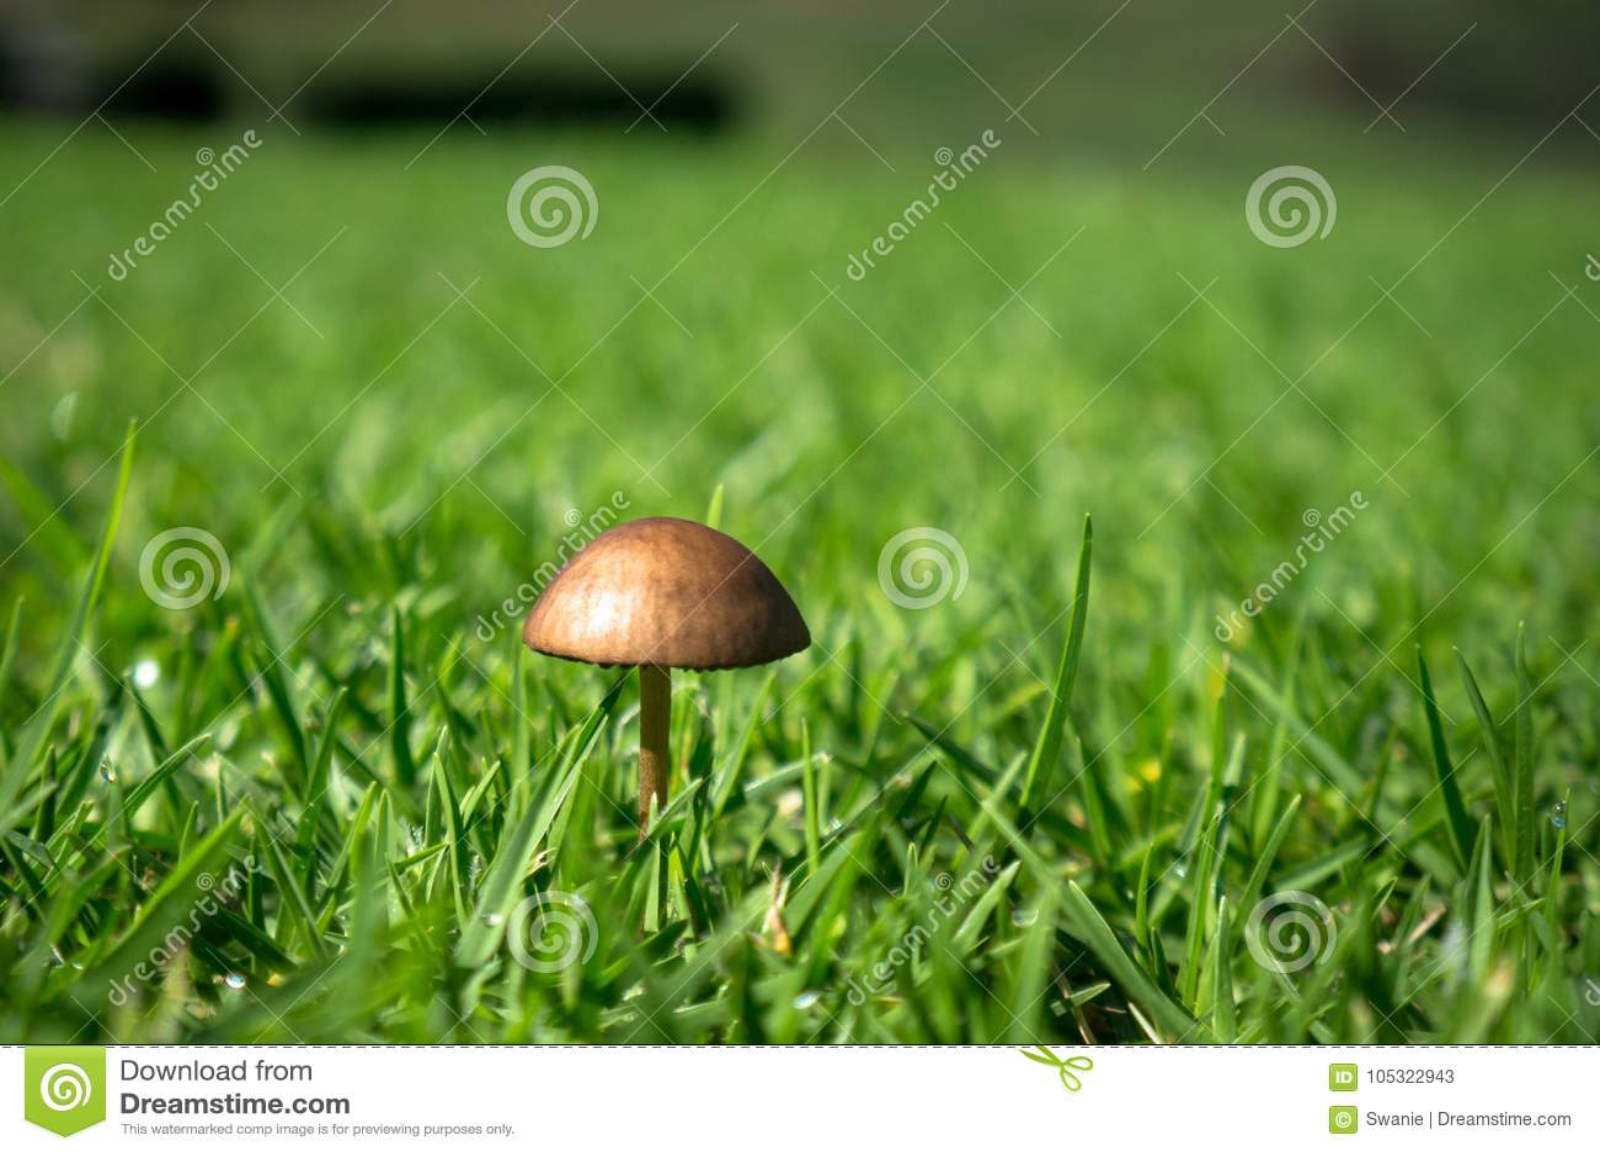 Cogumelo diminuto na grama verde